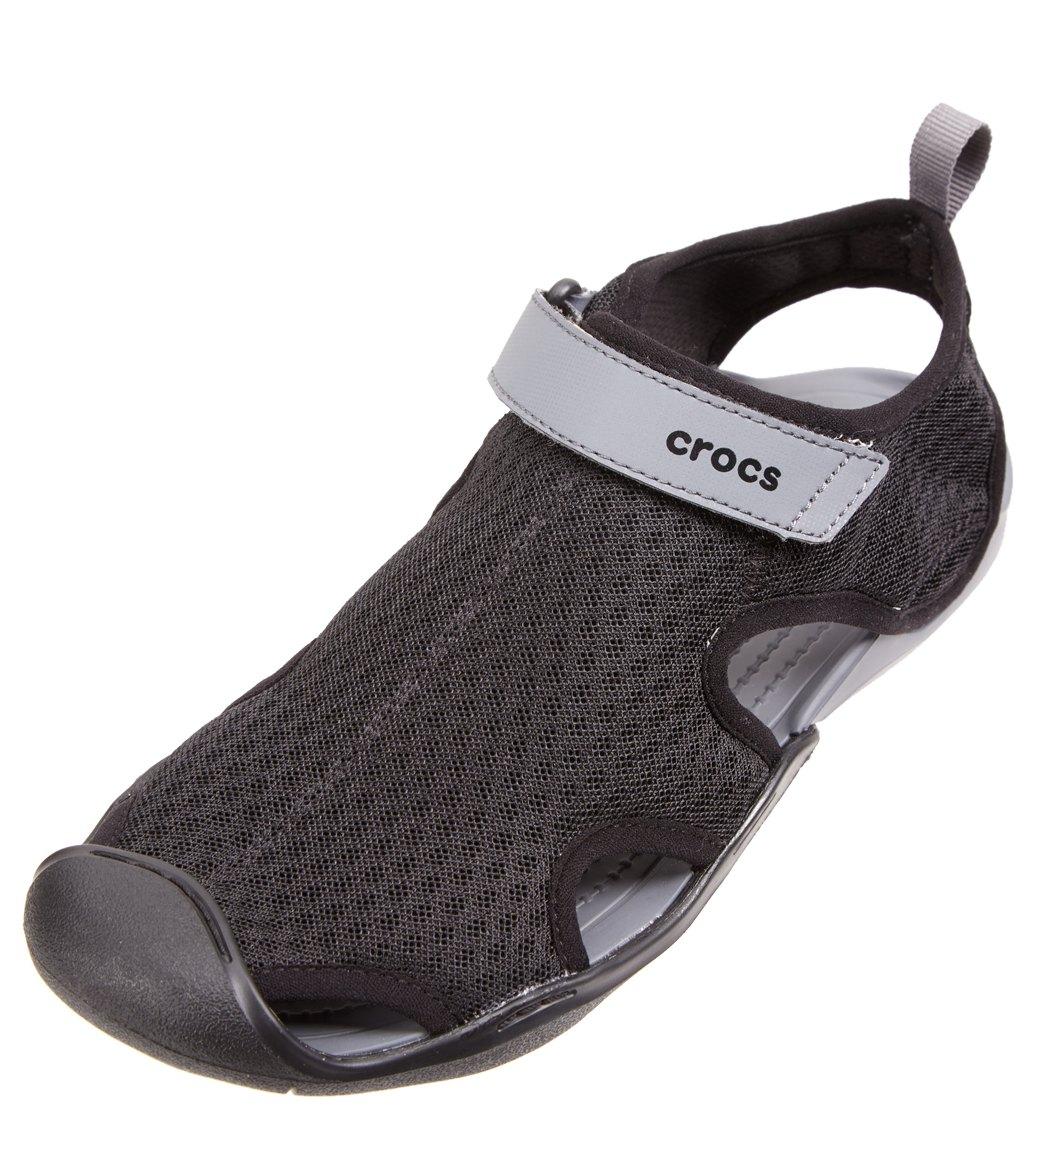 036dd3cccf37 Crocs Women s Swiftwater Mesh Water Shoe at SwimOutlet.com - Free Shipping